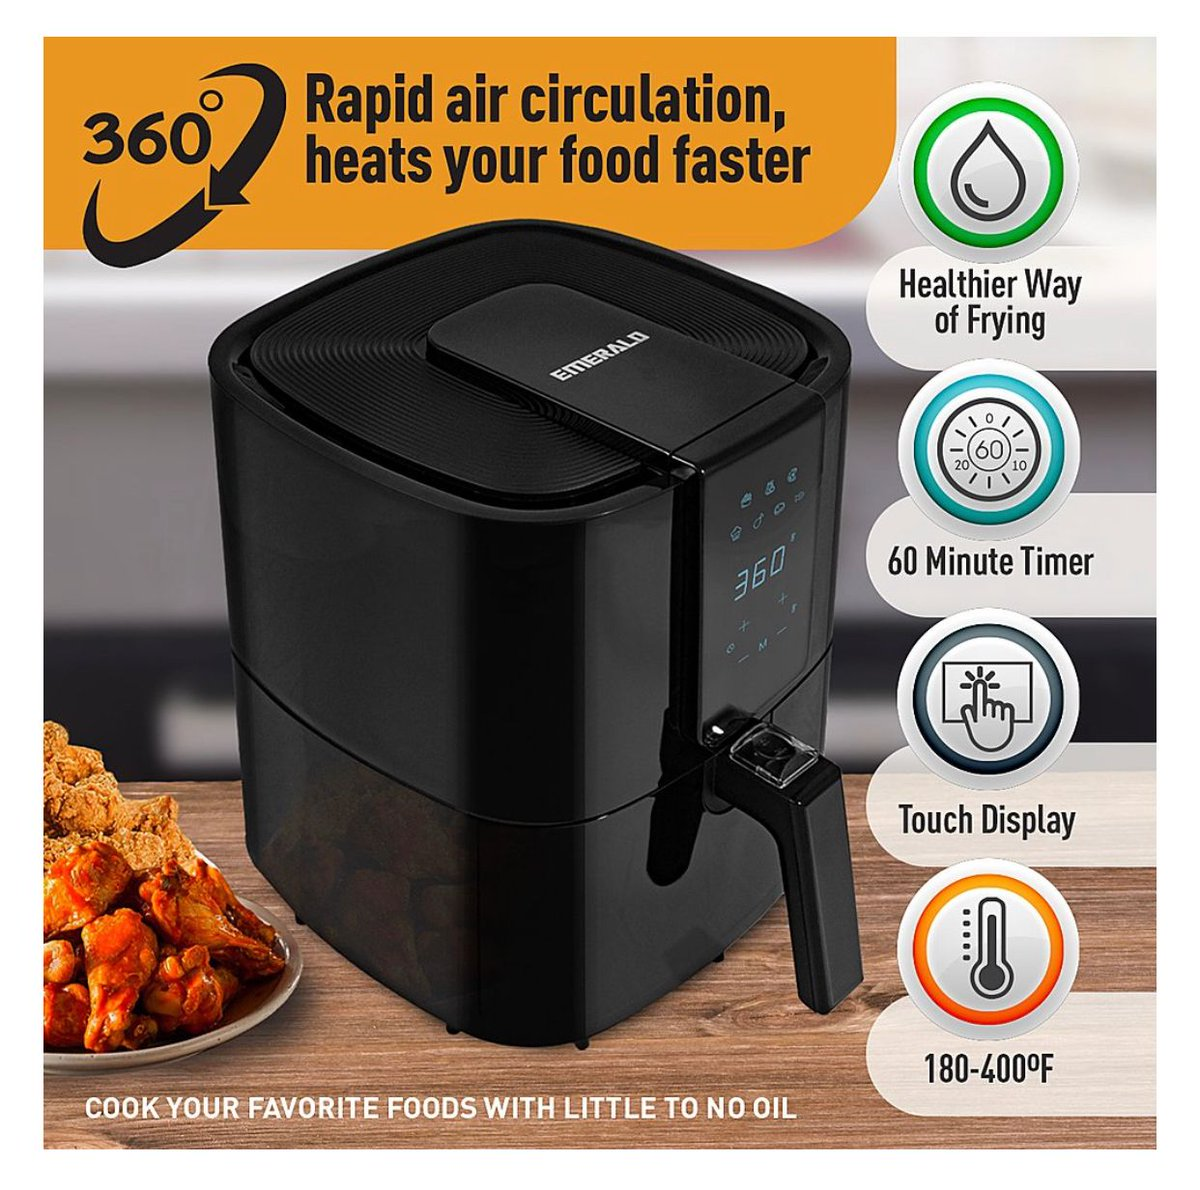 ad: $39.99  (50% off)  Emerald 5.2L Digital Air Fryer   Link0 Link0